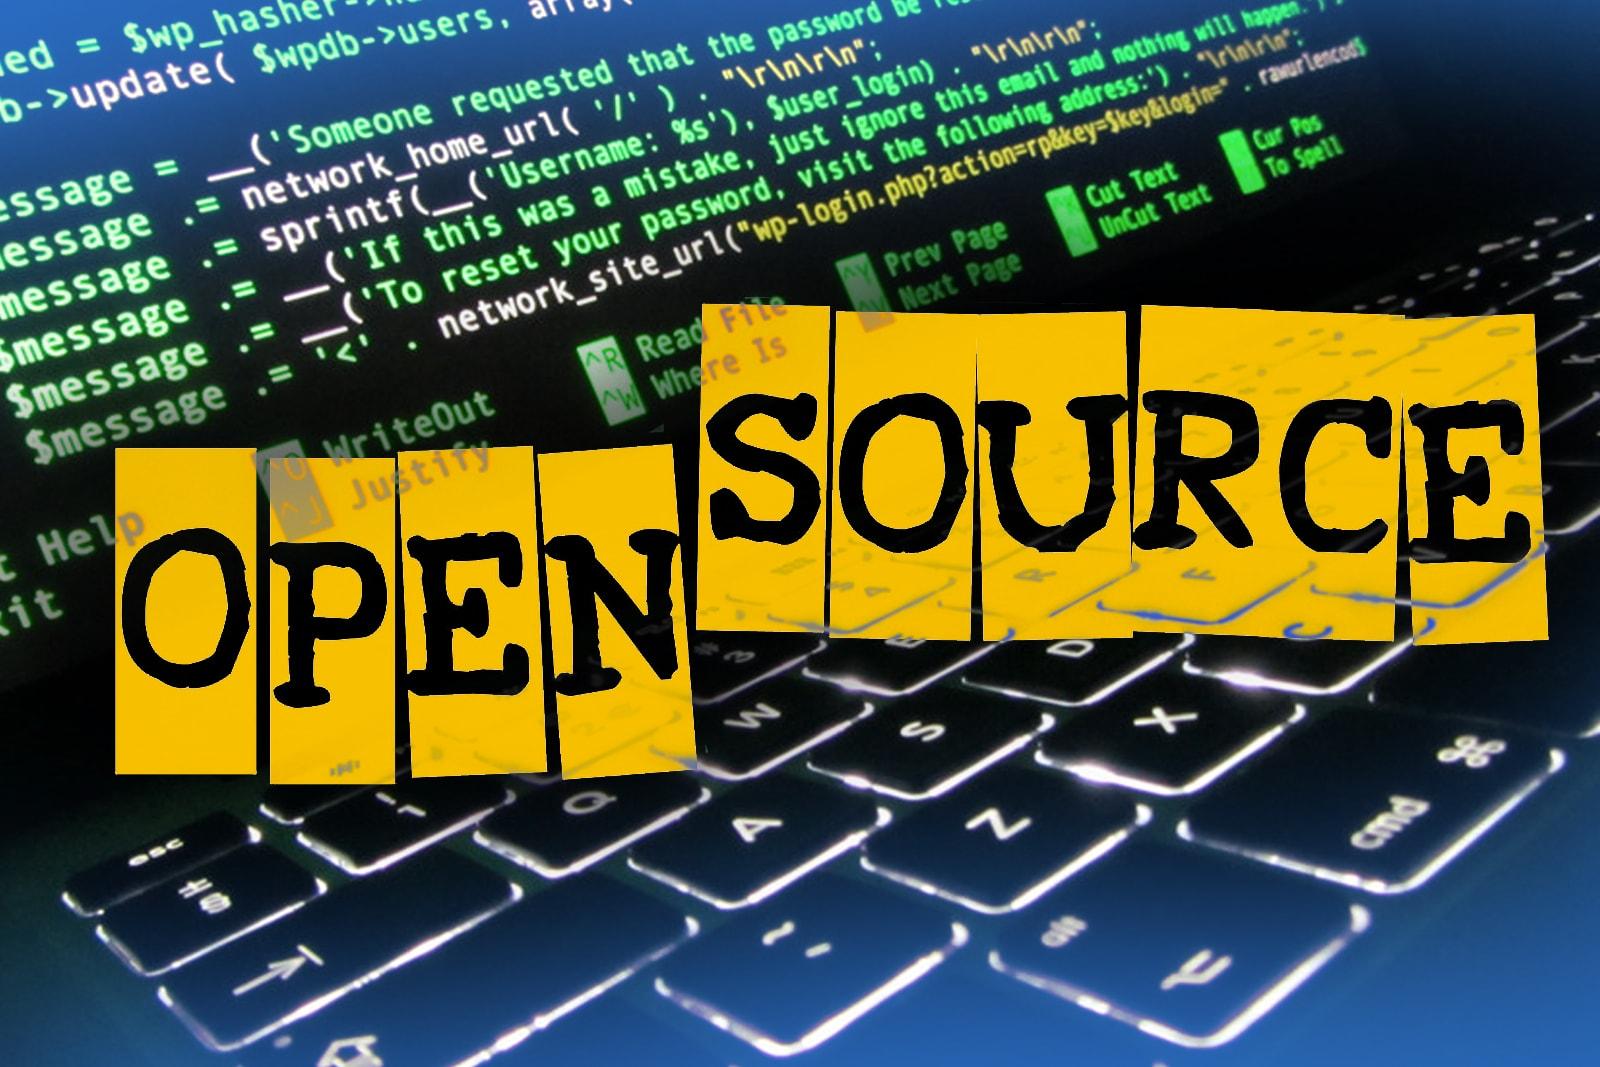 open source solution development